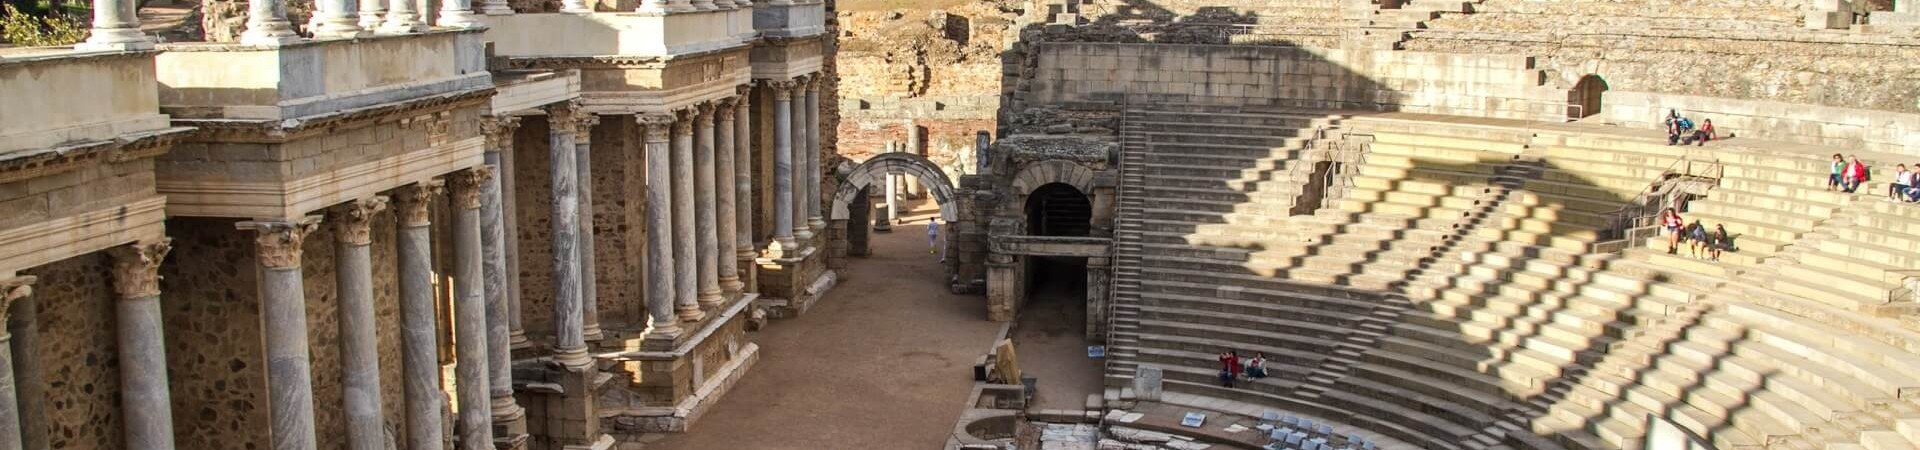 Merida teatr rzymski